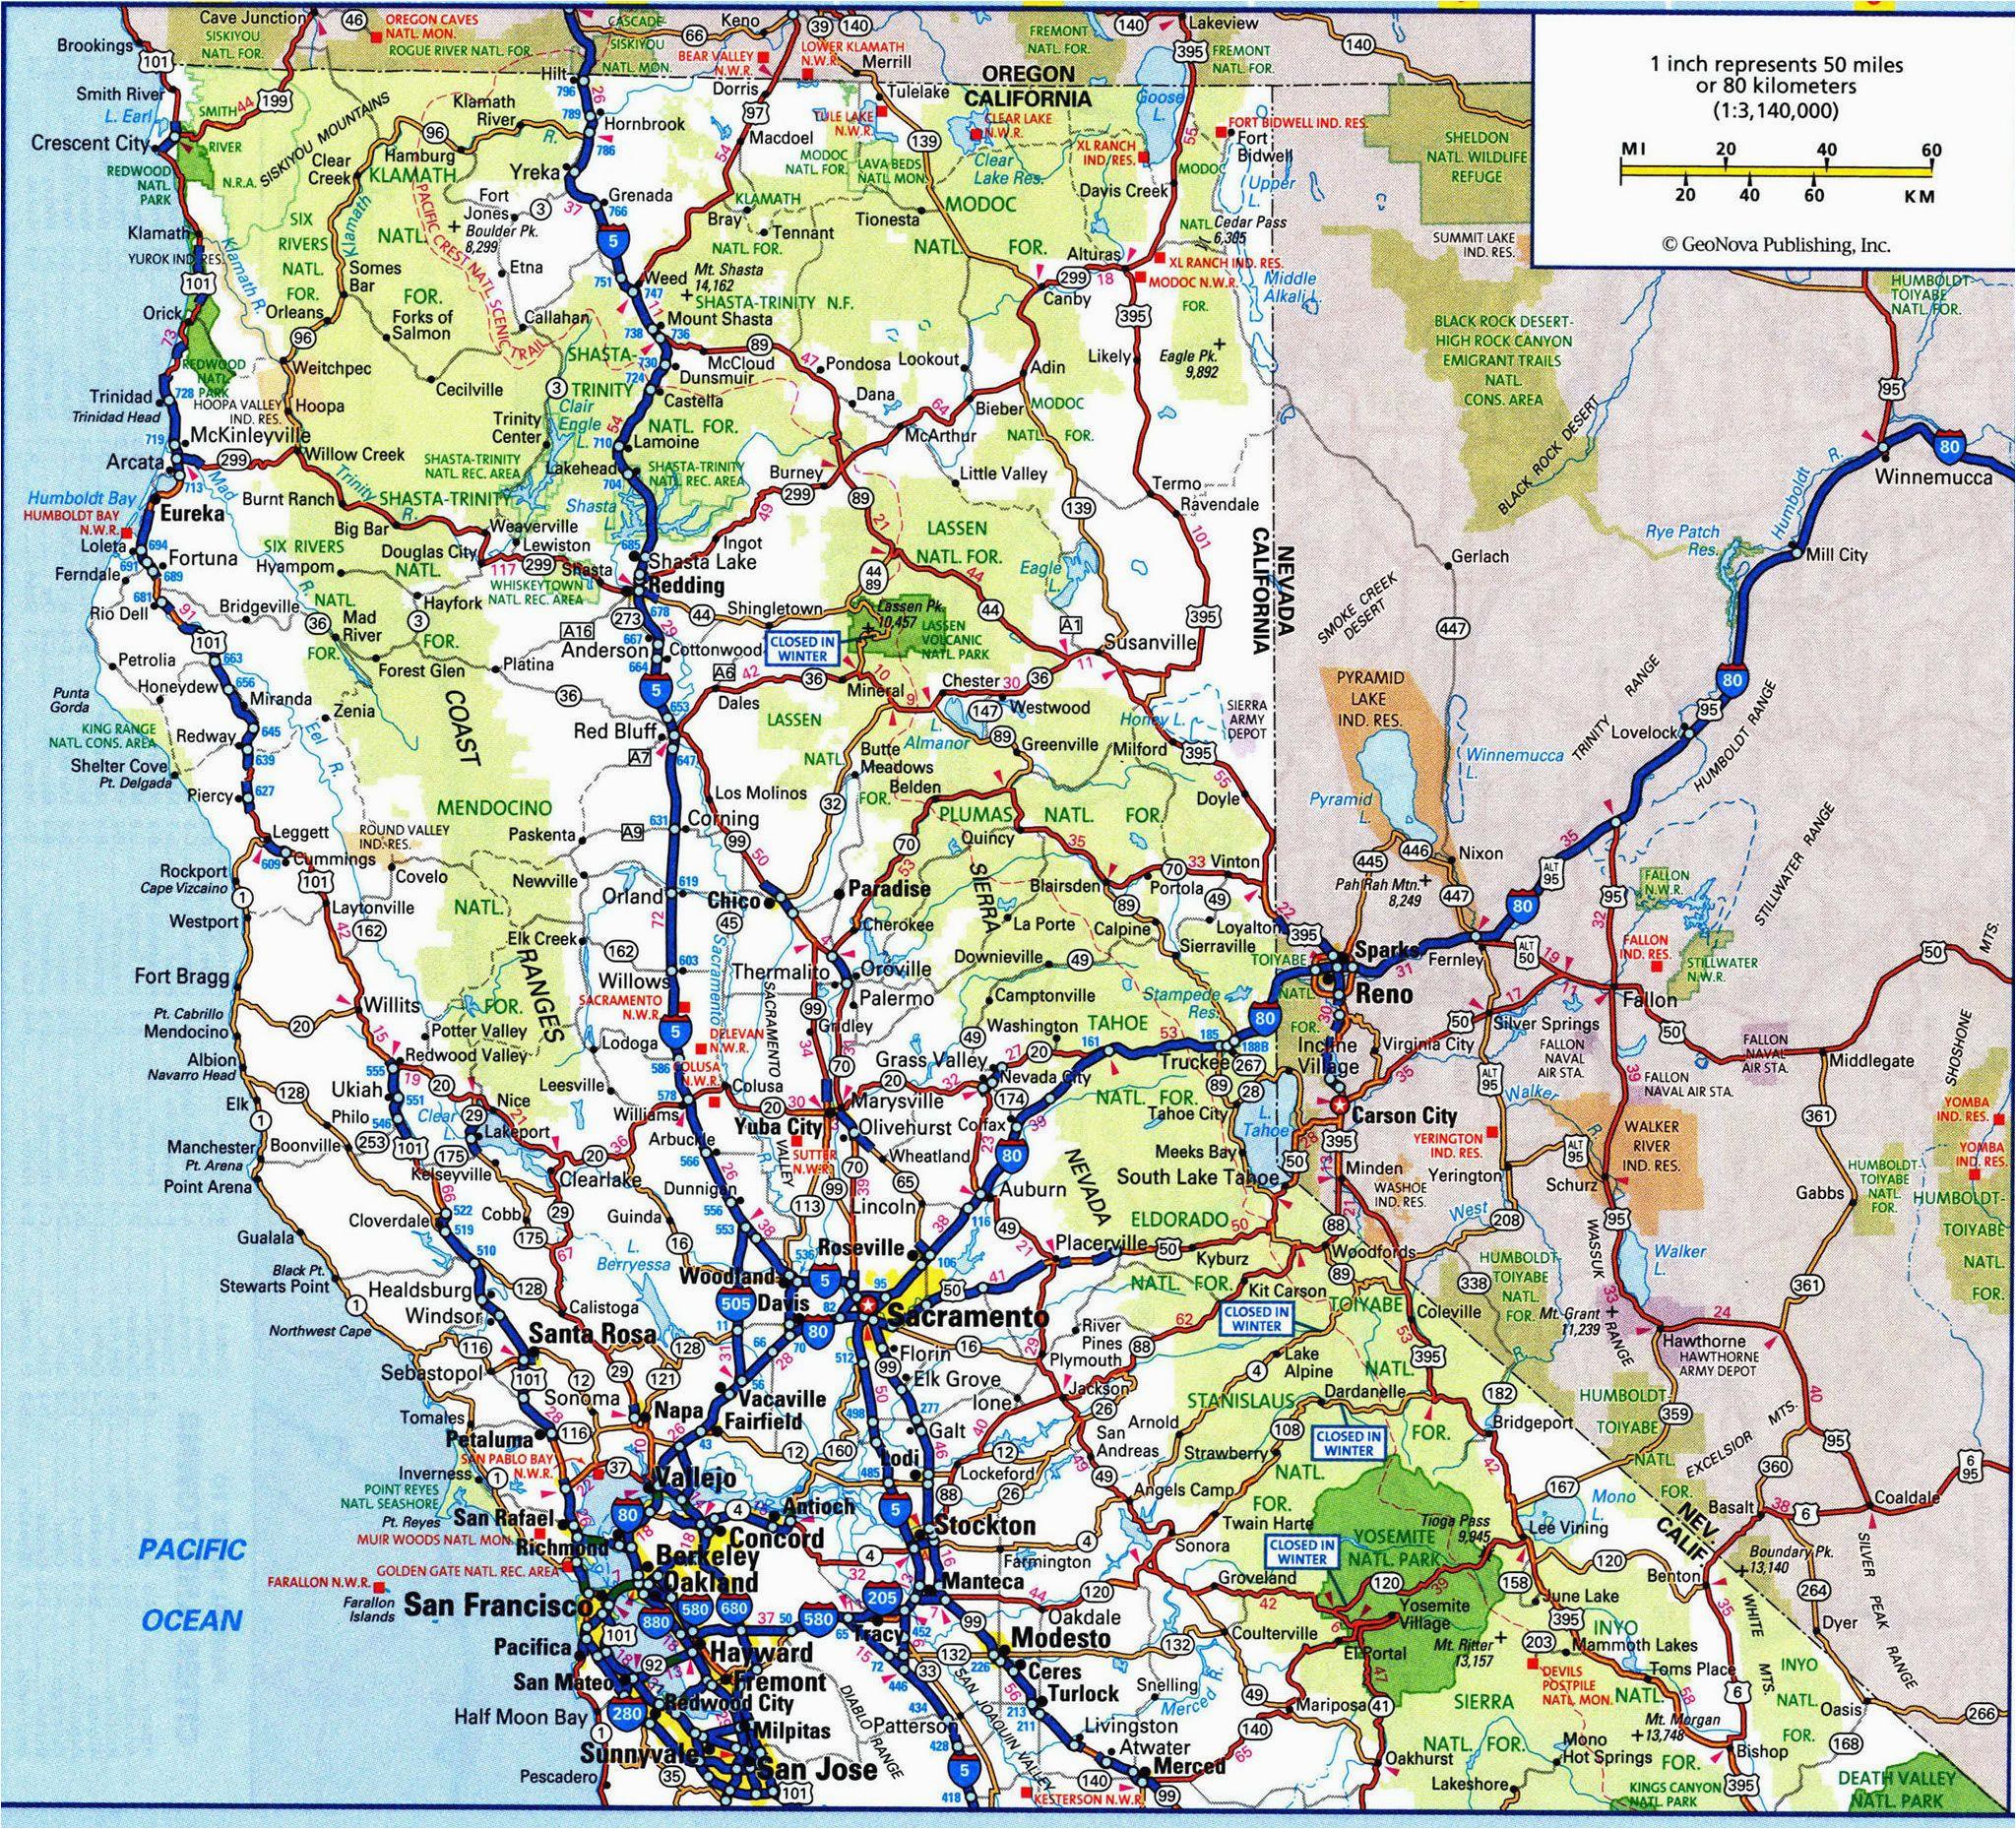 Southeast Oregon Map Secretmuseum - Southeast-us-road-map